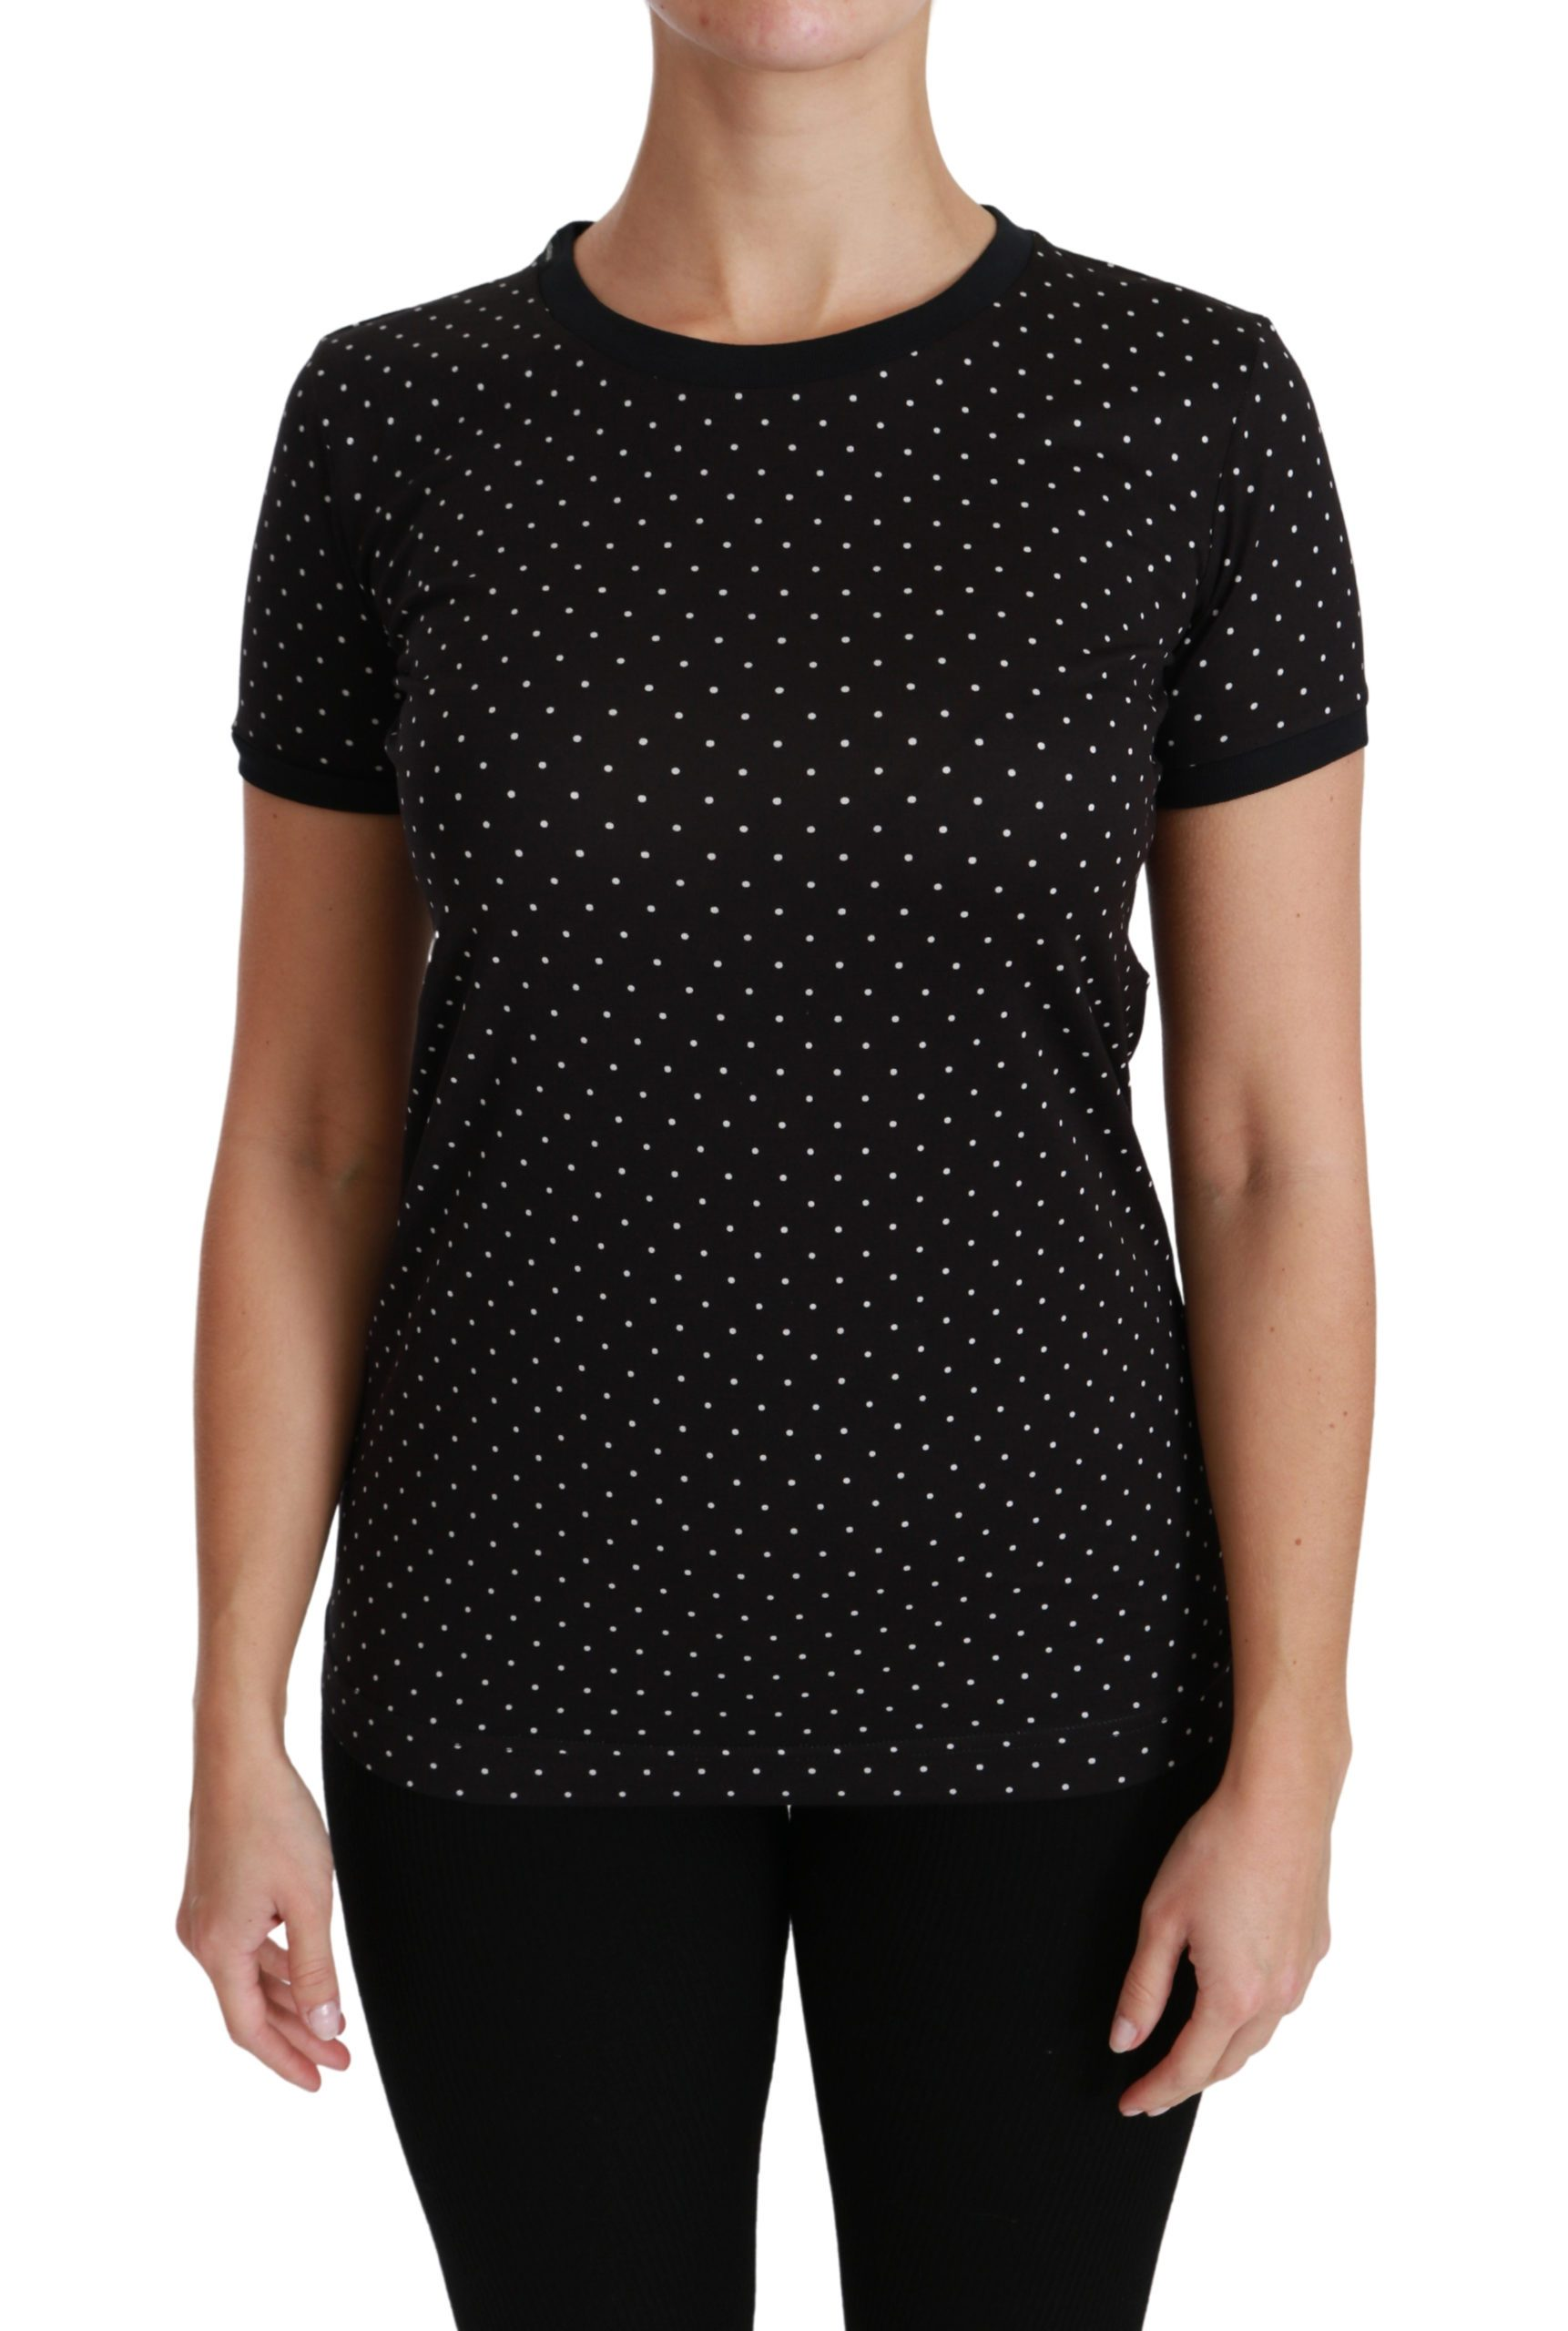 Dolce & Gabbana Women's Short sleeve T-shirts Black TSH4431 - IT36   XS